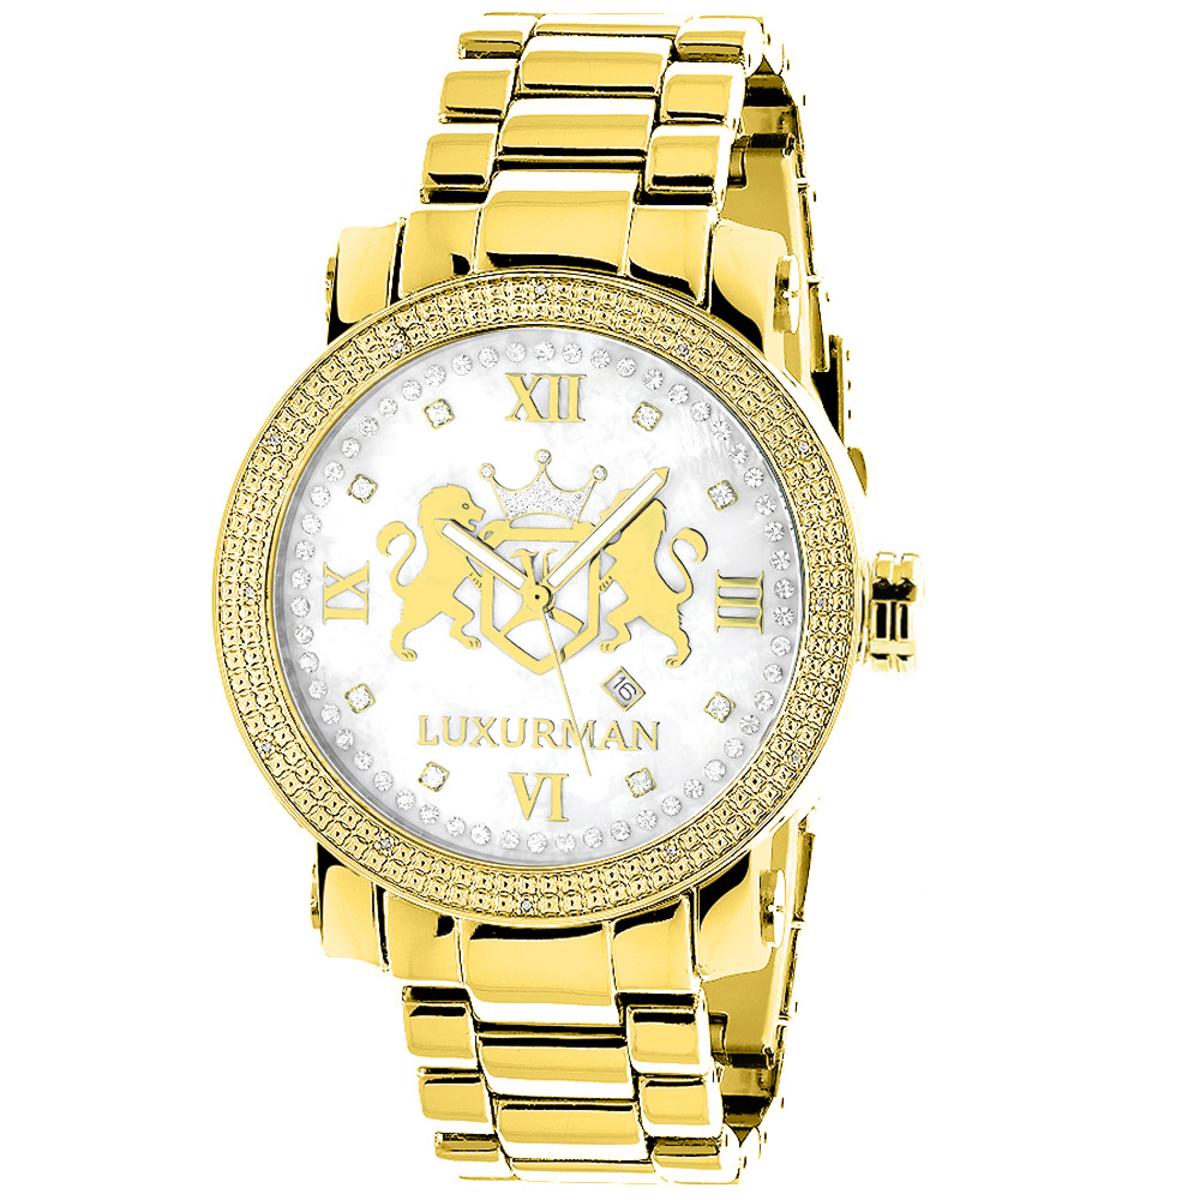 Yellow Gold Plated Diamond Watch for Men by Luxurman Phantom 0.12ct